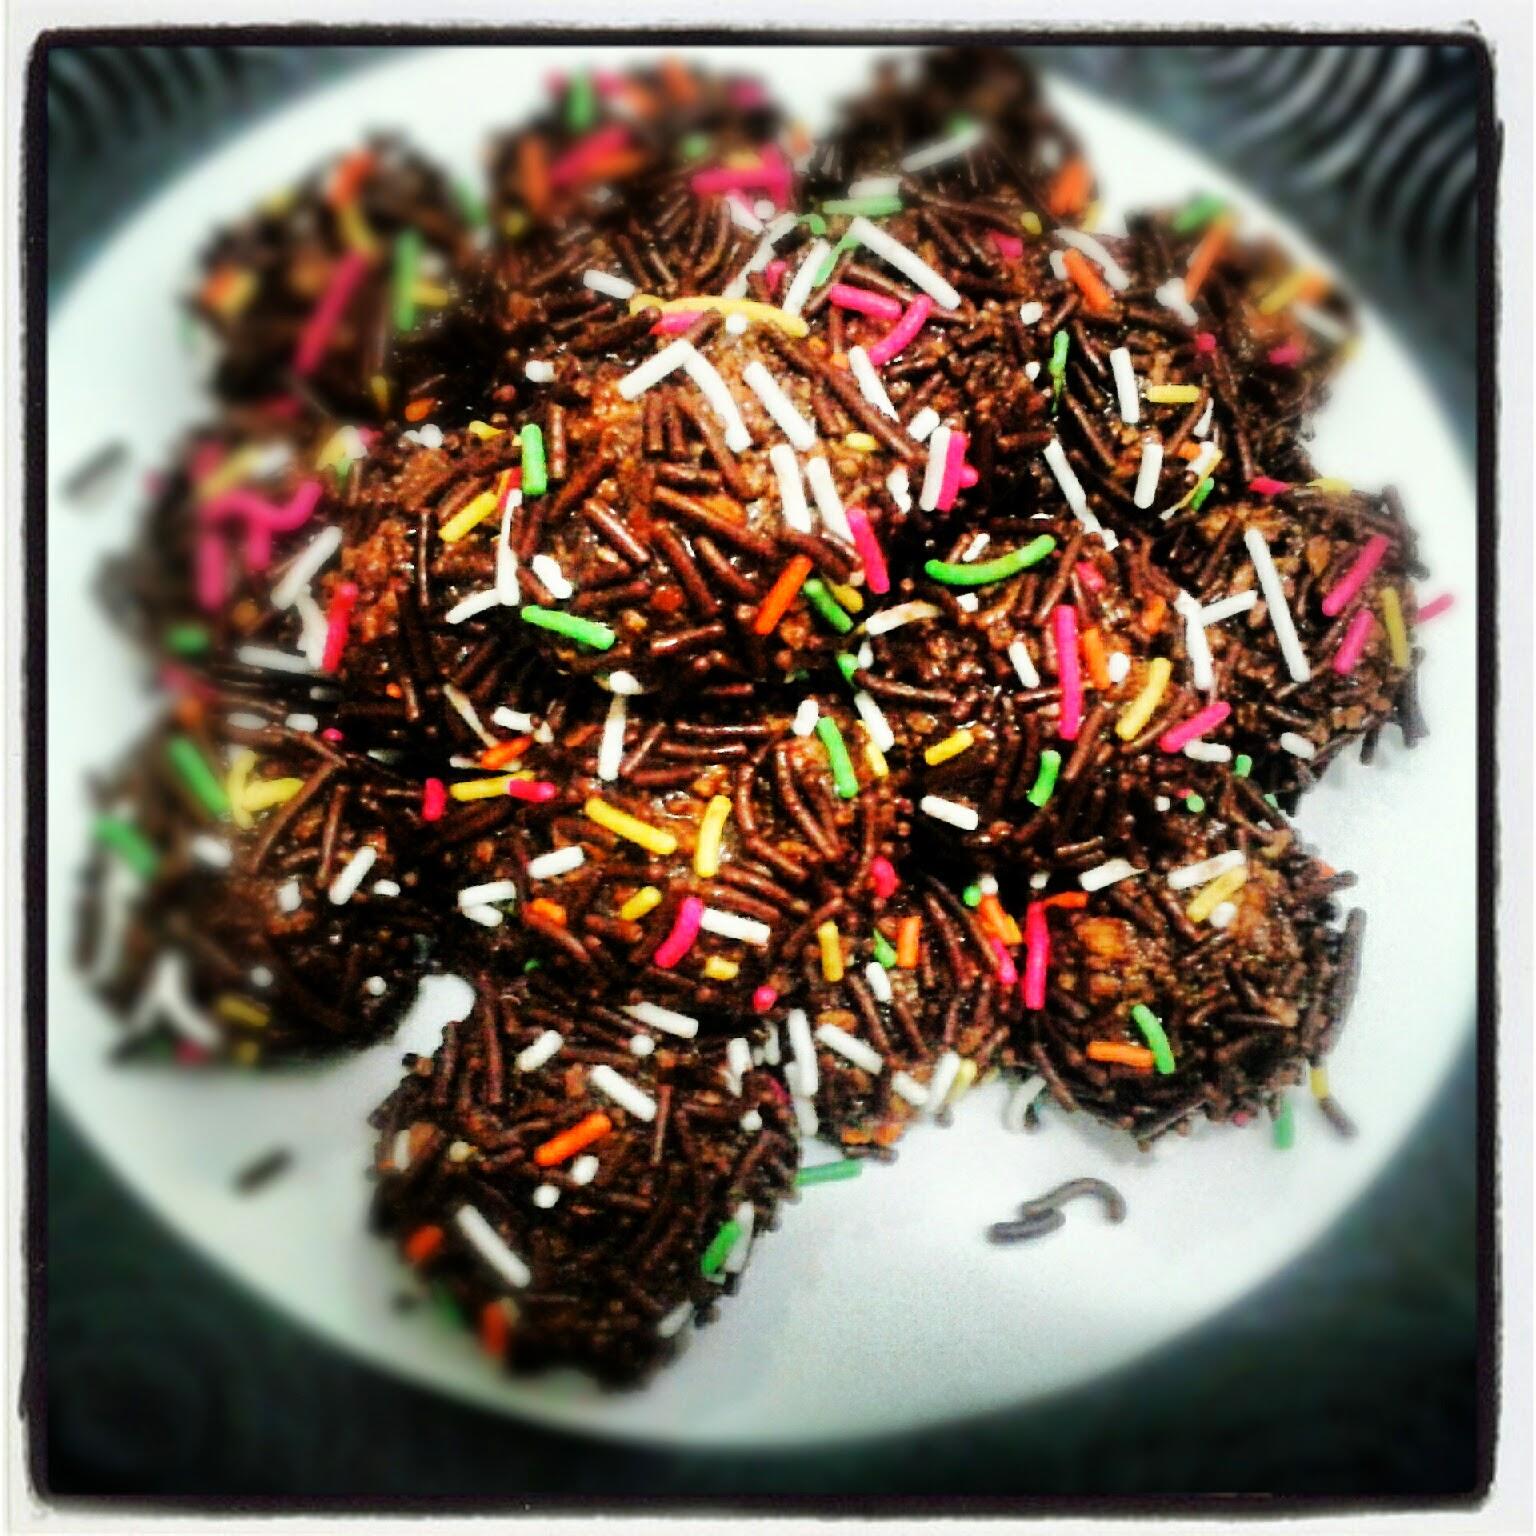 Resep Kue Kering Coklat Lezat dan Renyah